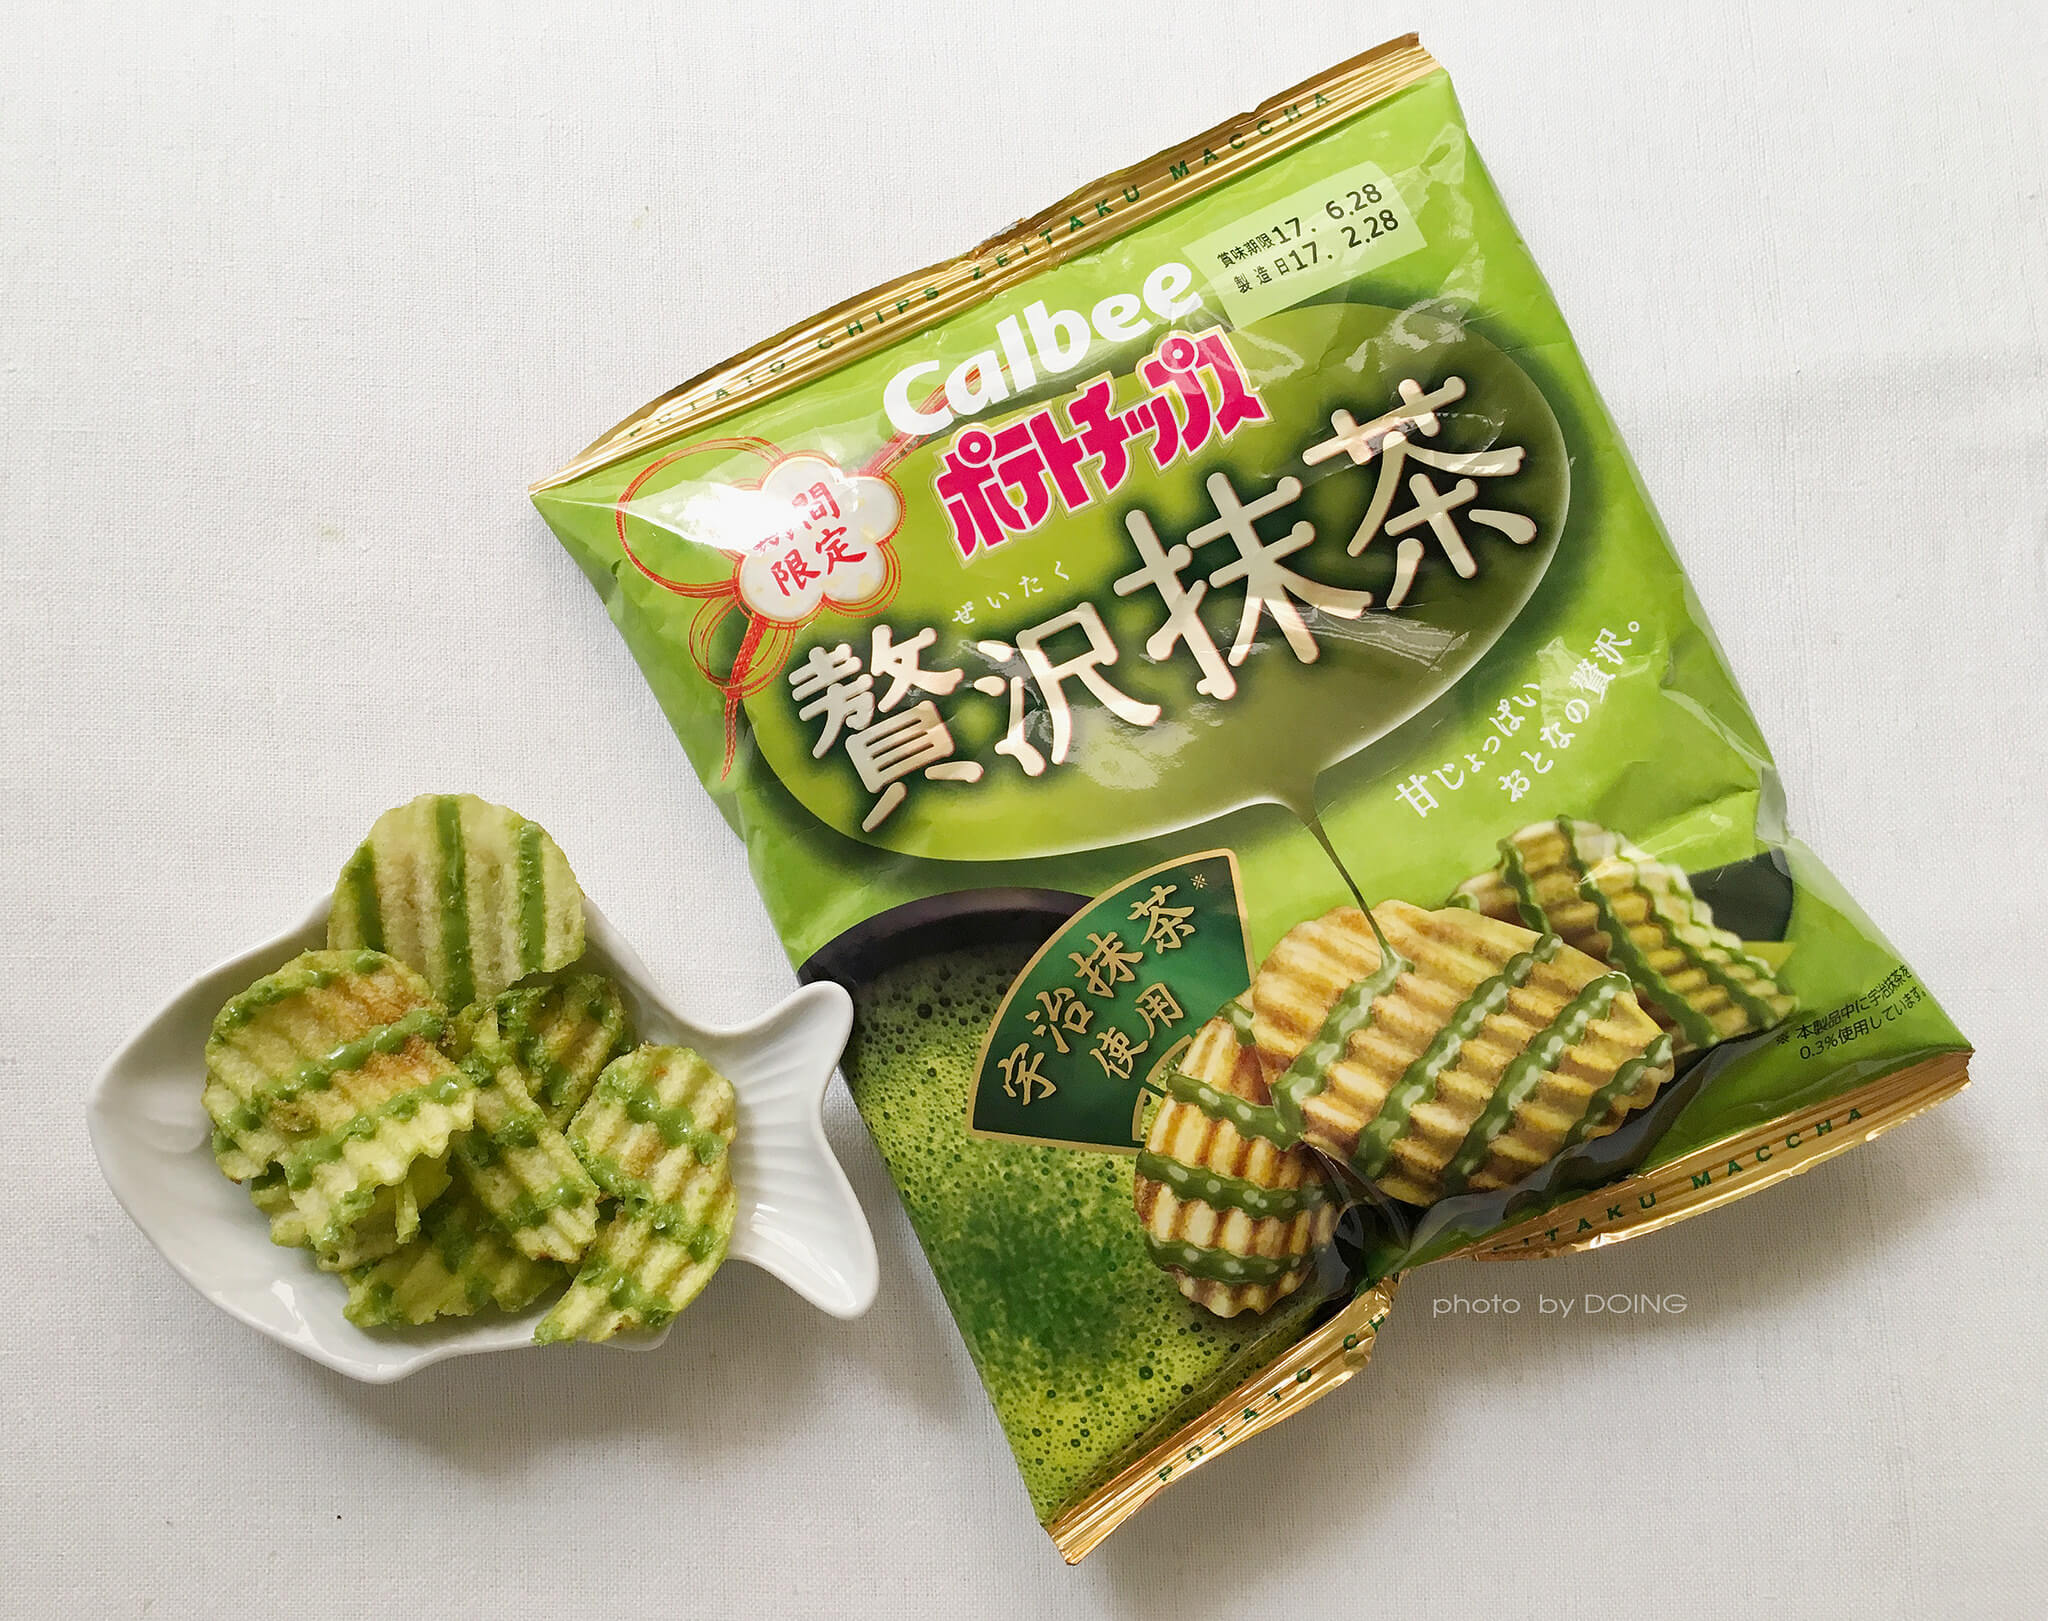 Calbee Matcha Chips Arigato Japan